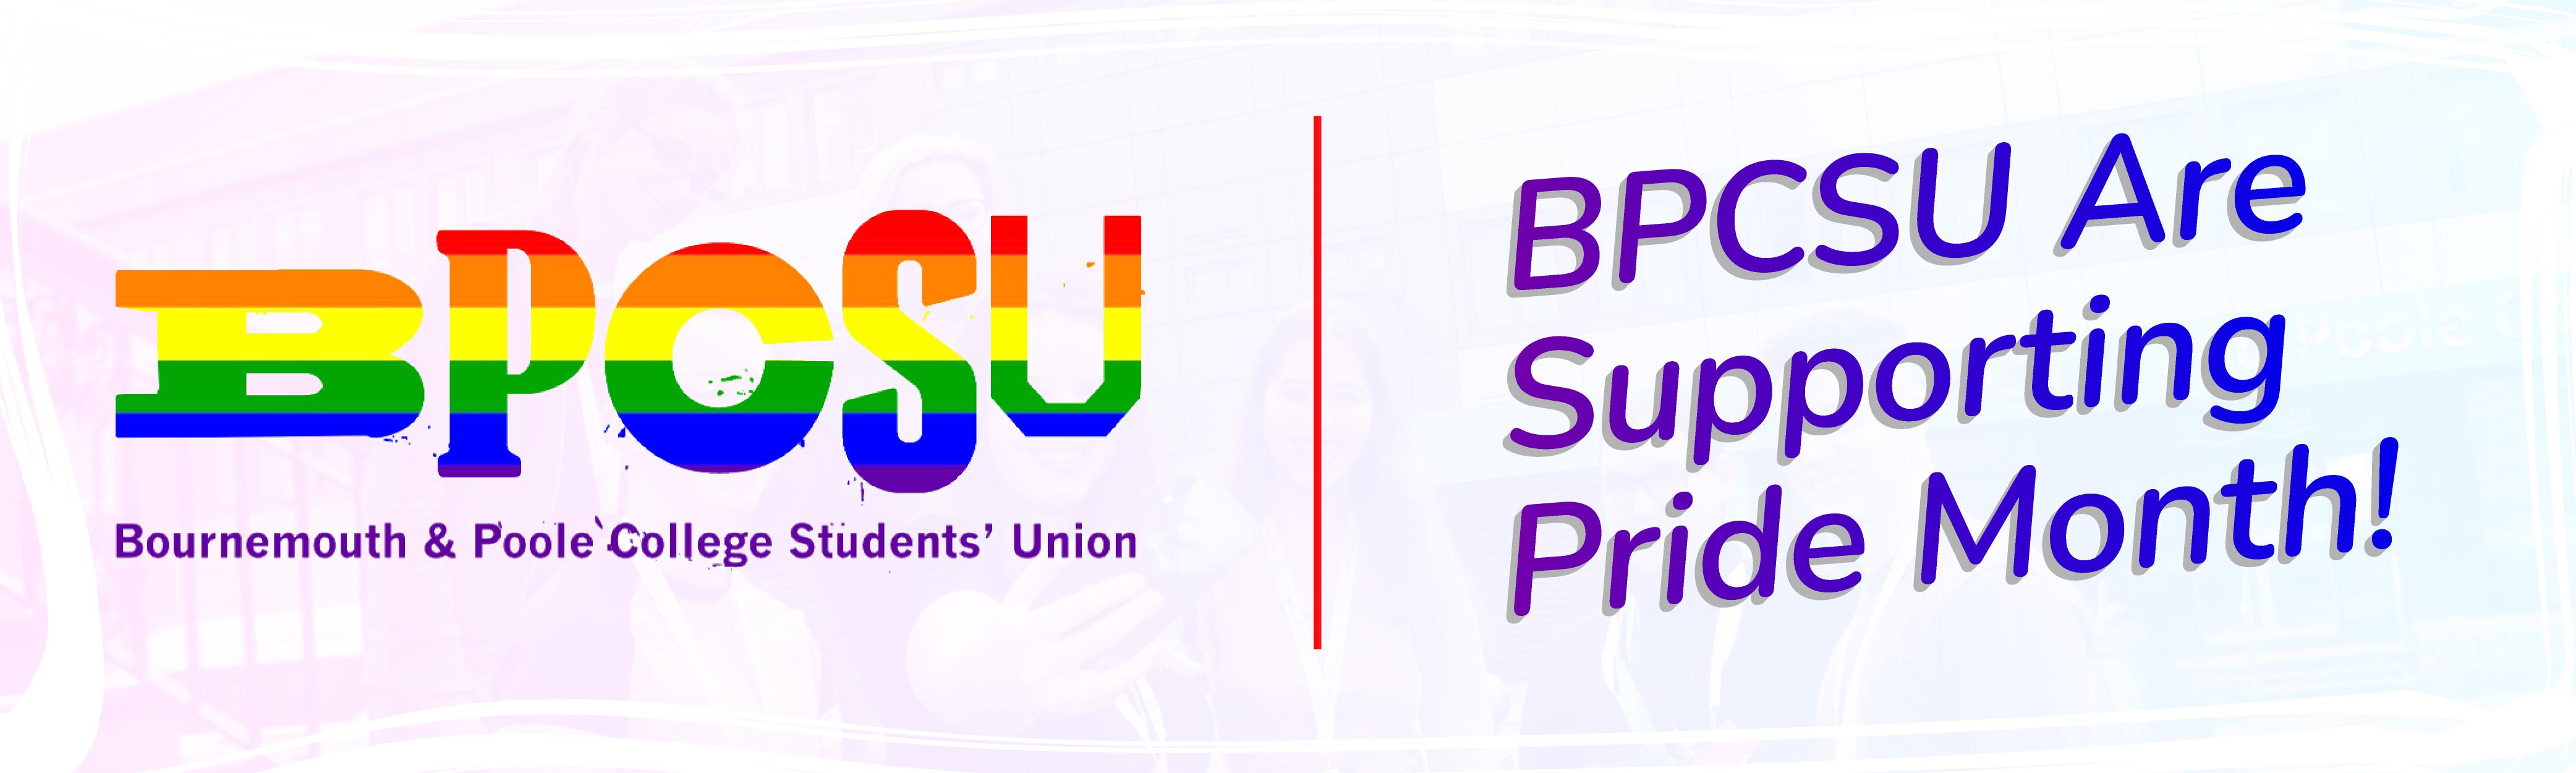 Pride bpcsu banner 01